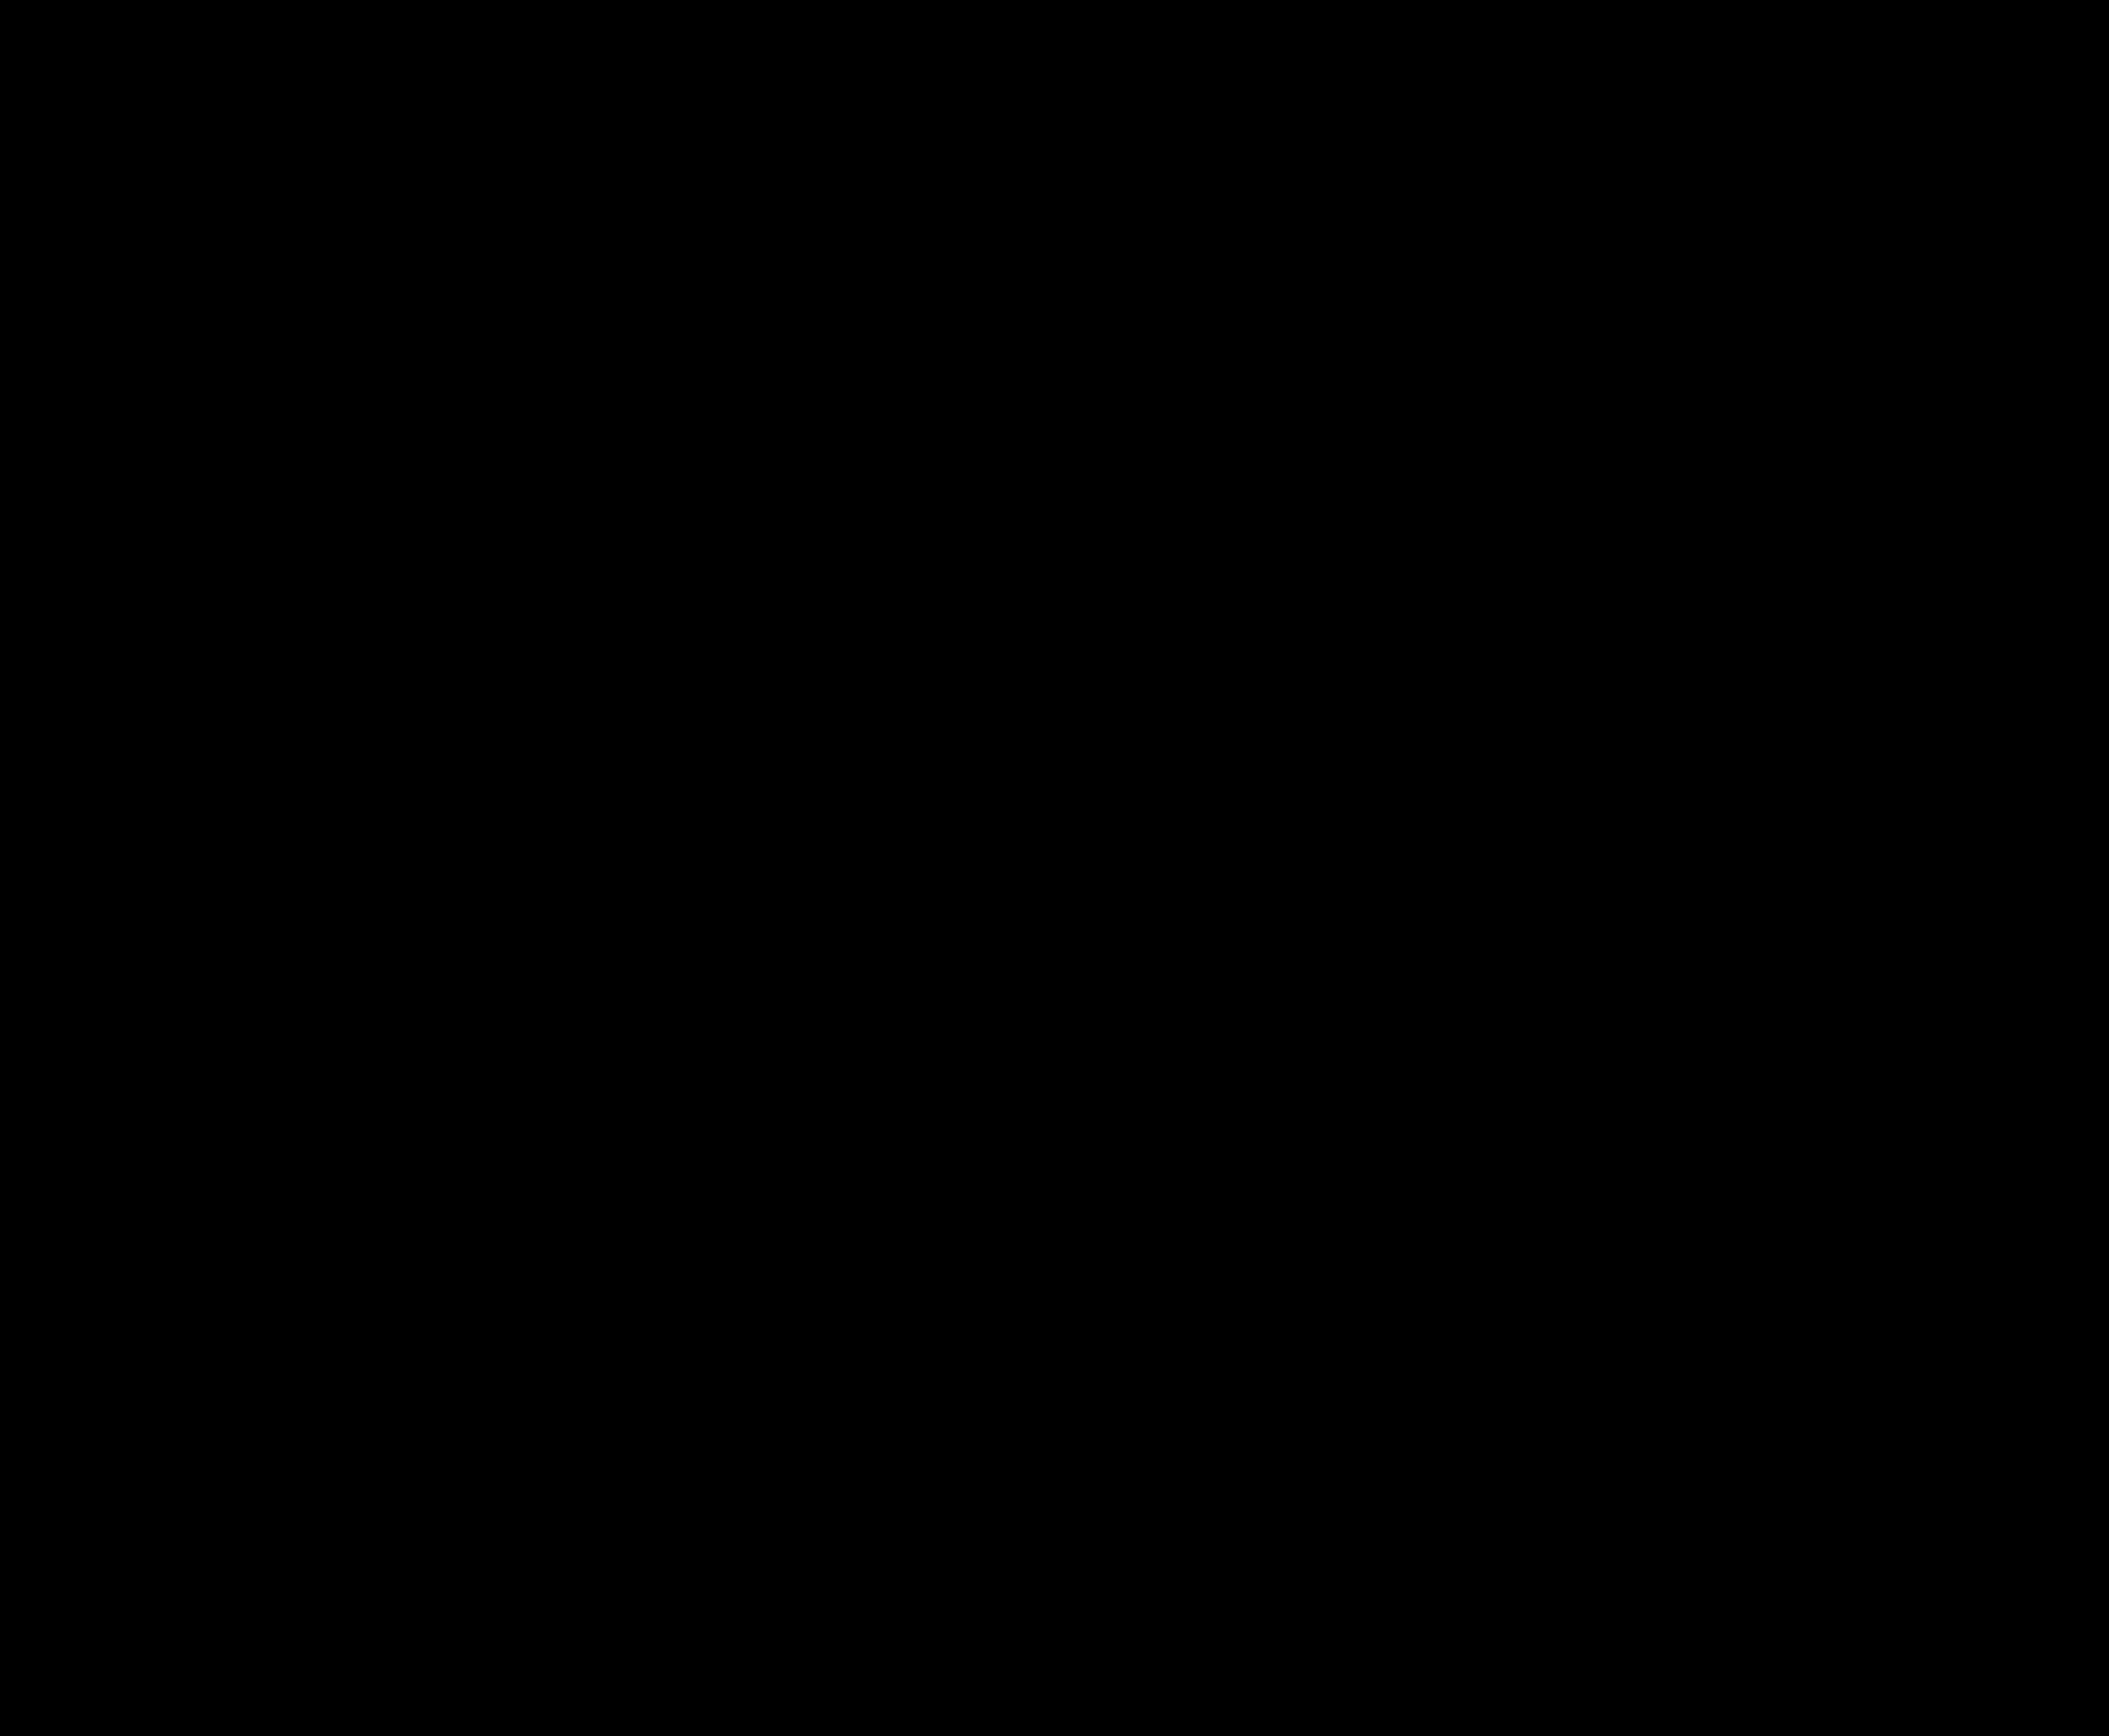 png transparent Wifi clipart. Four bars signal big